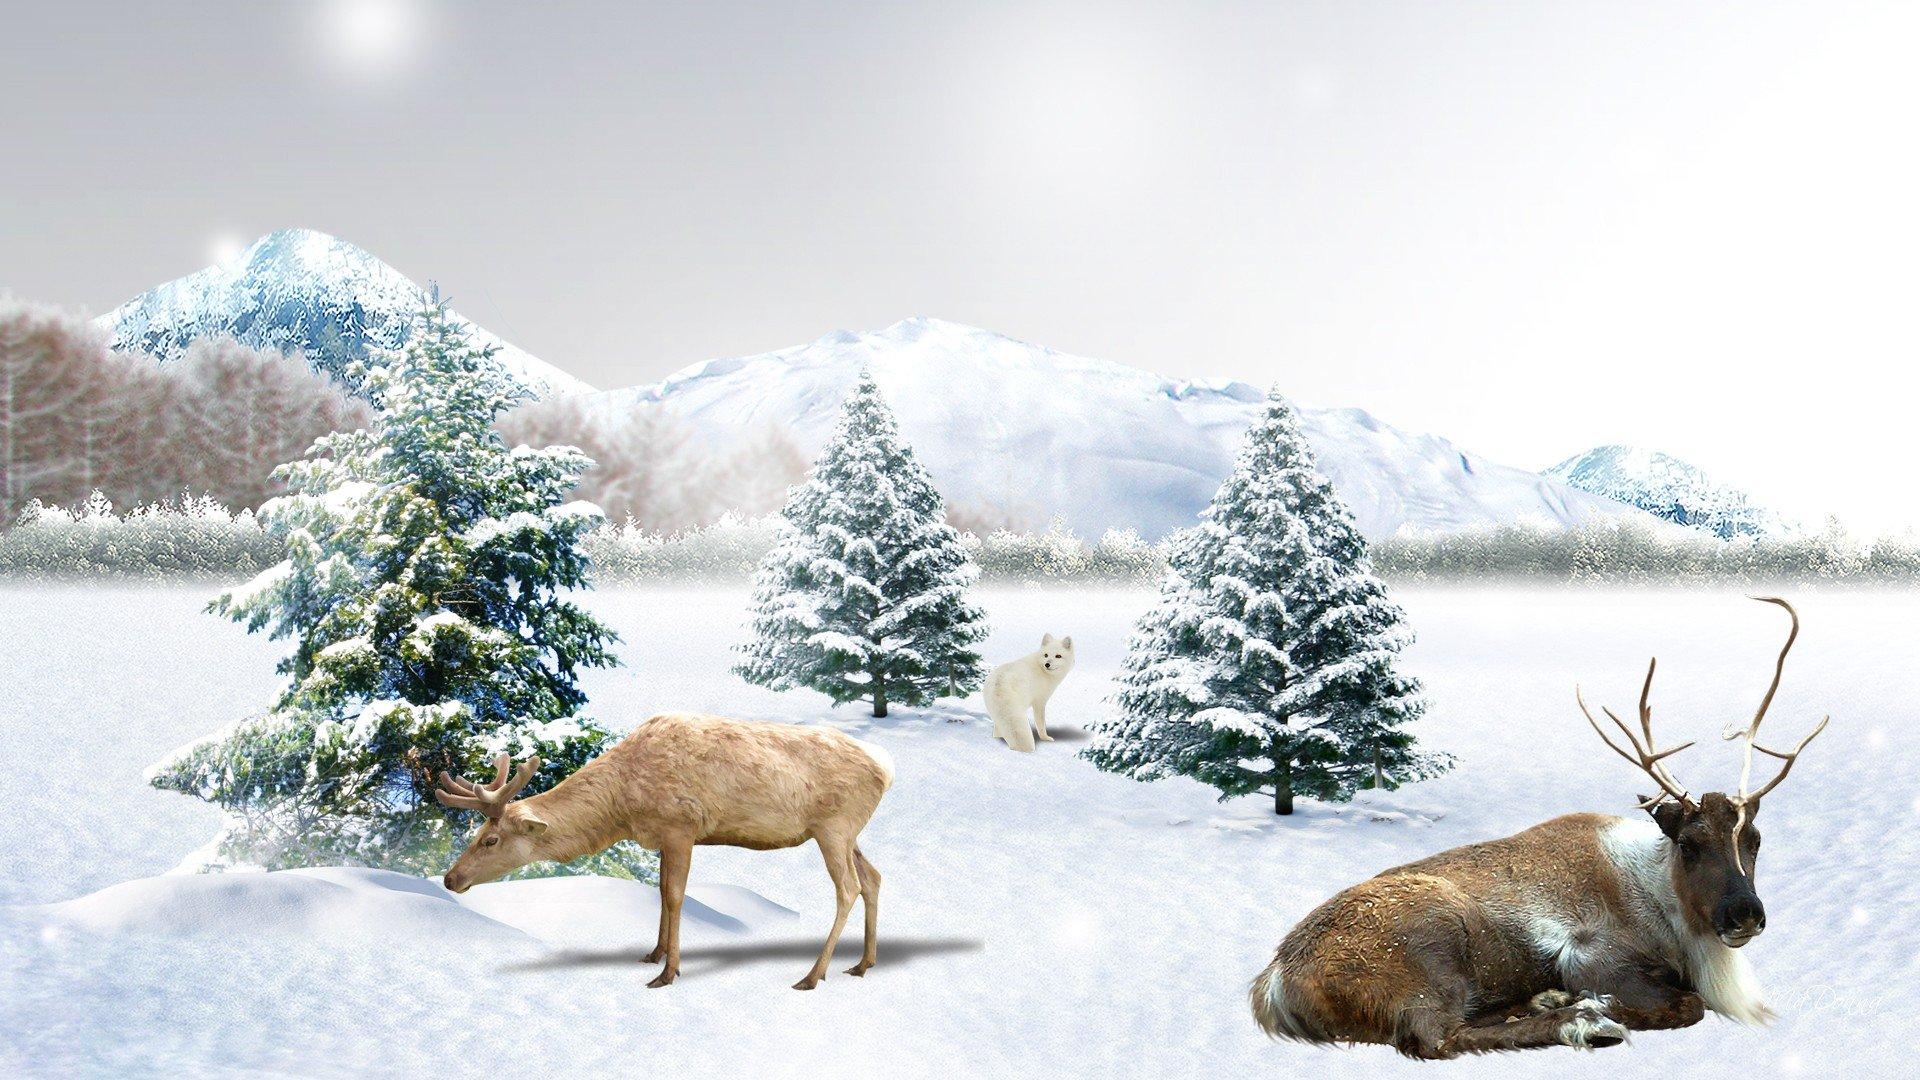 Early Winter Snow wallpaper   ForWallpapercom 1920x1080